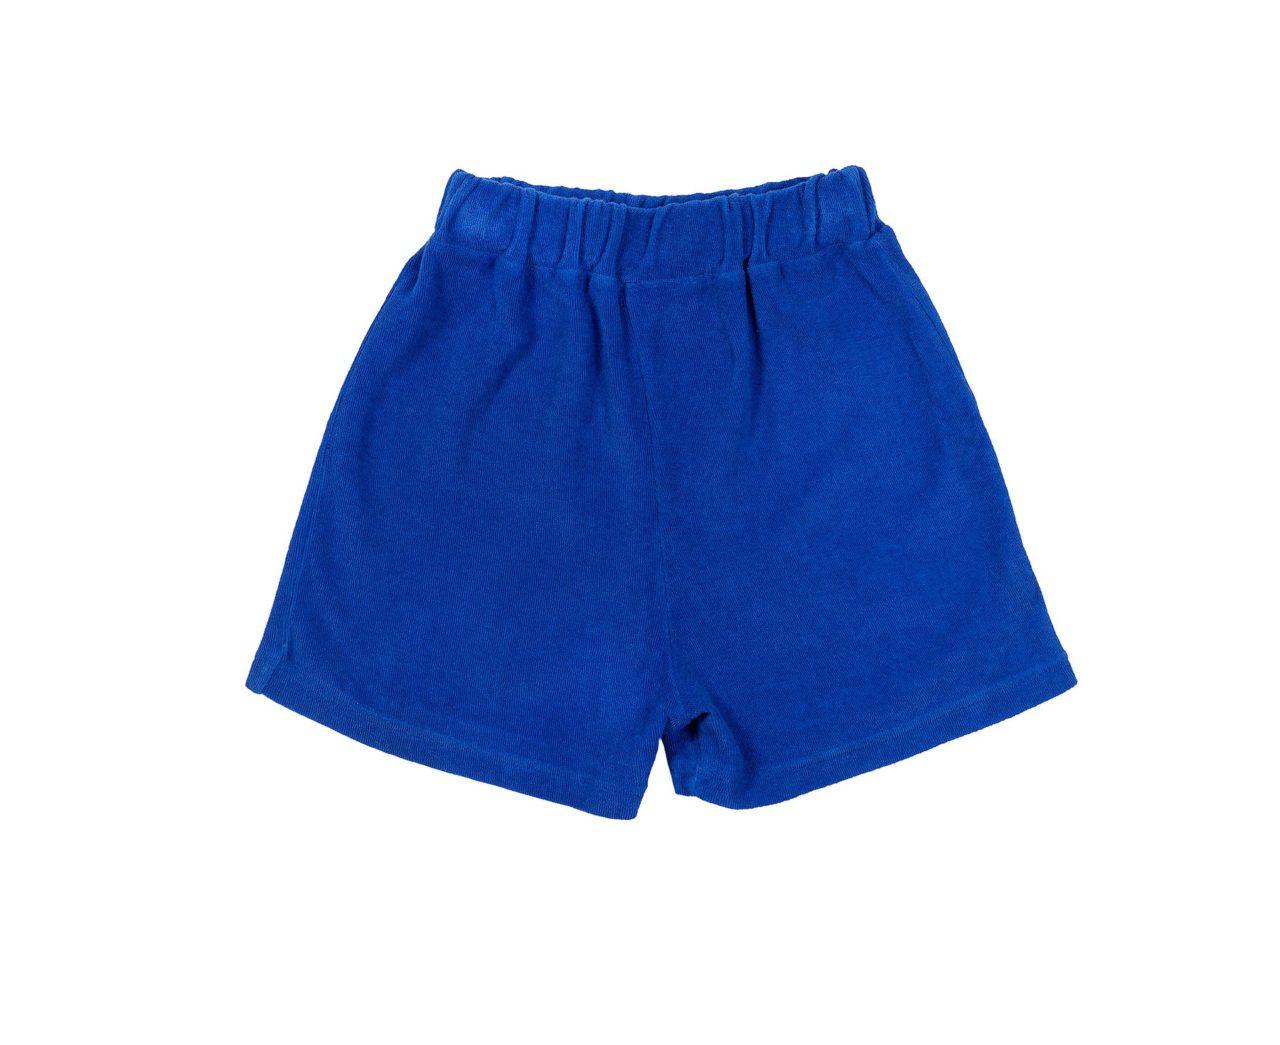 thecampamento_blue_shorts_01